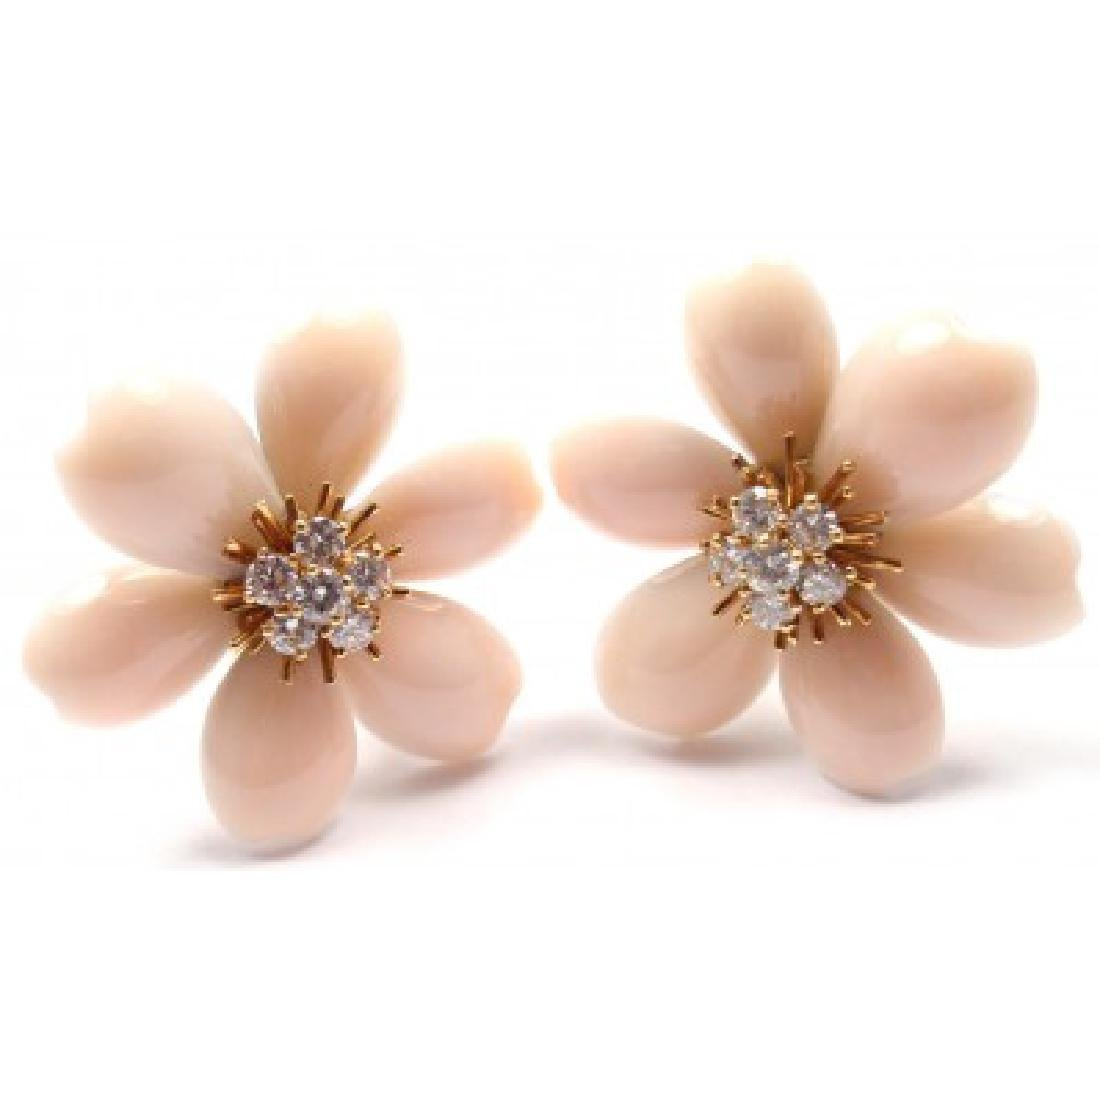 VAN CLEEF & ARPELS ROSE DE NOEL 18K DIAMOND CORAL